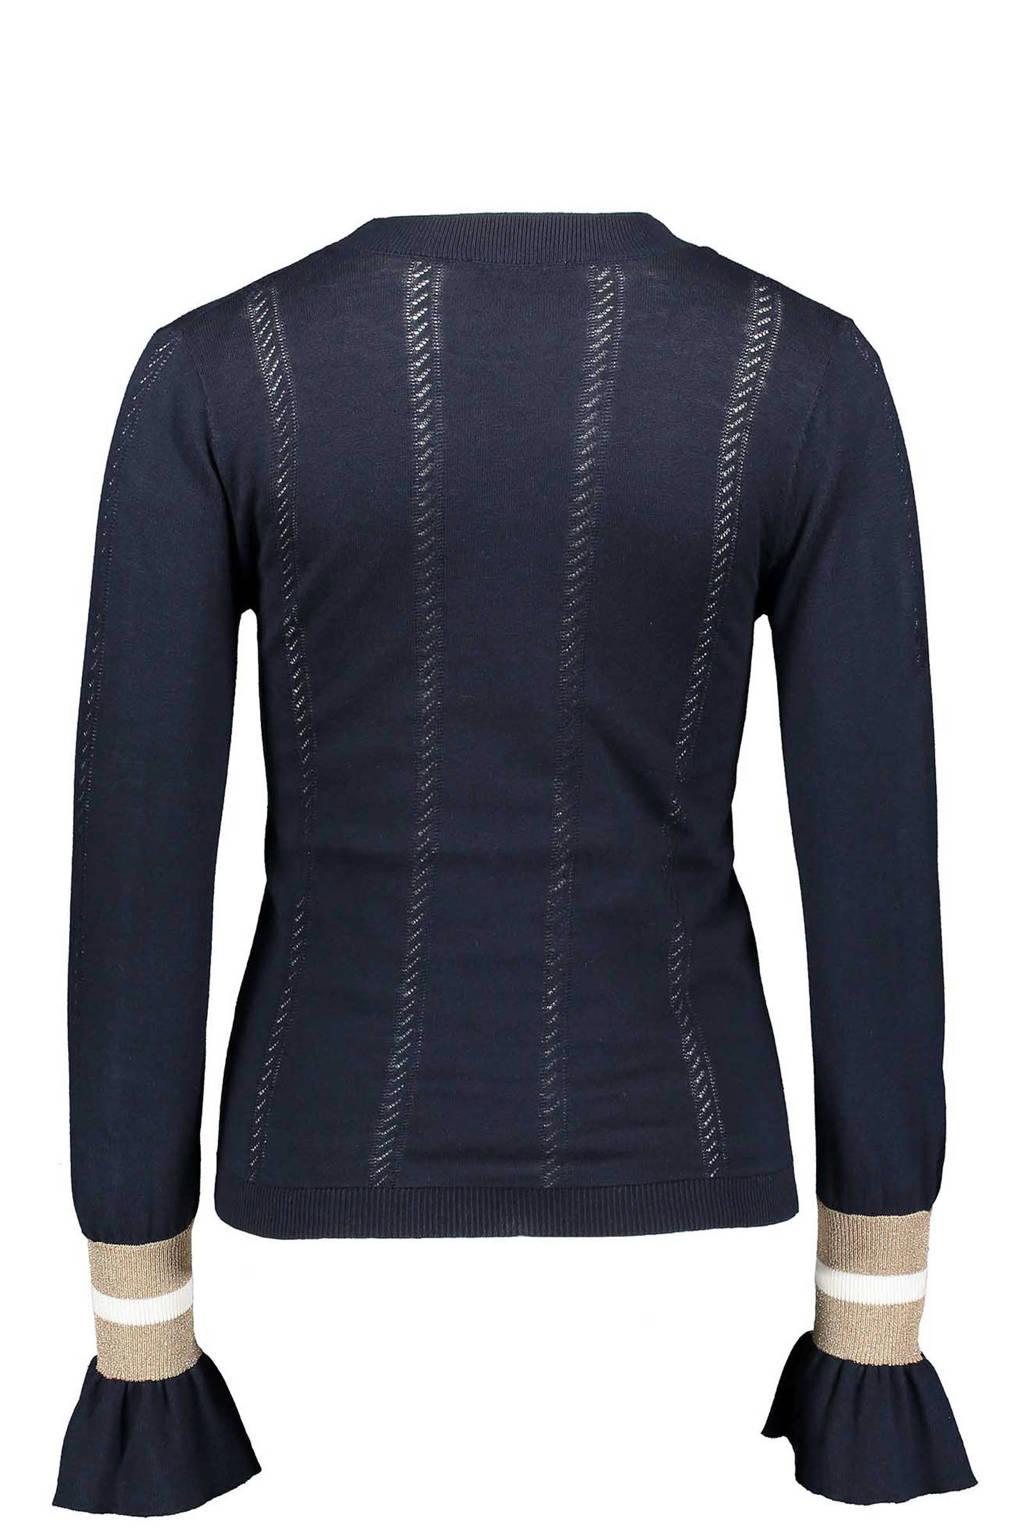 Sissy-Boy trui met lurex en wol donkerblauw, Donkerblauw